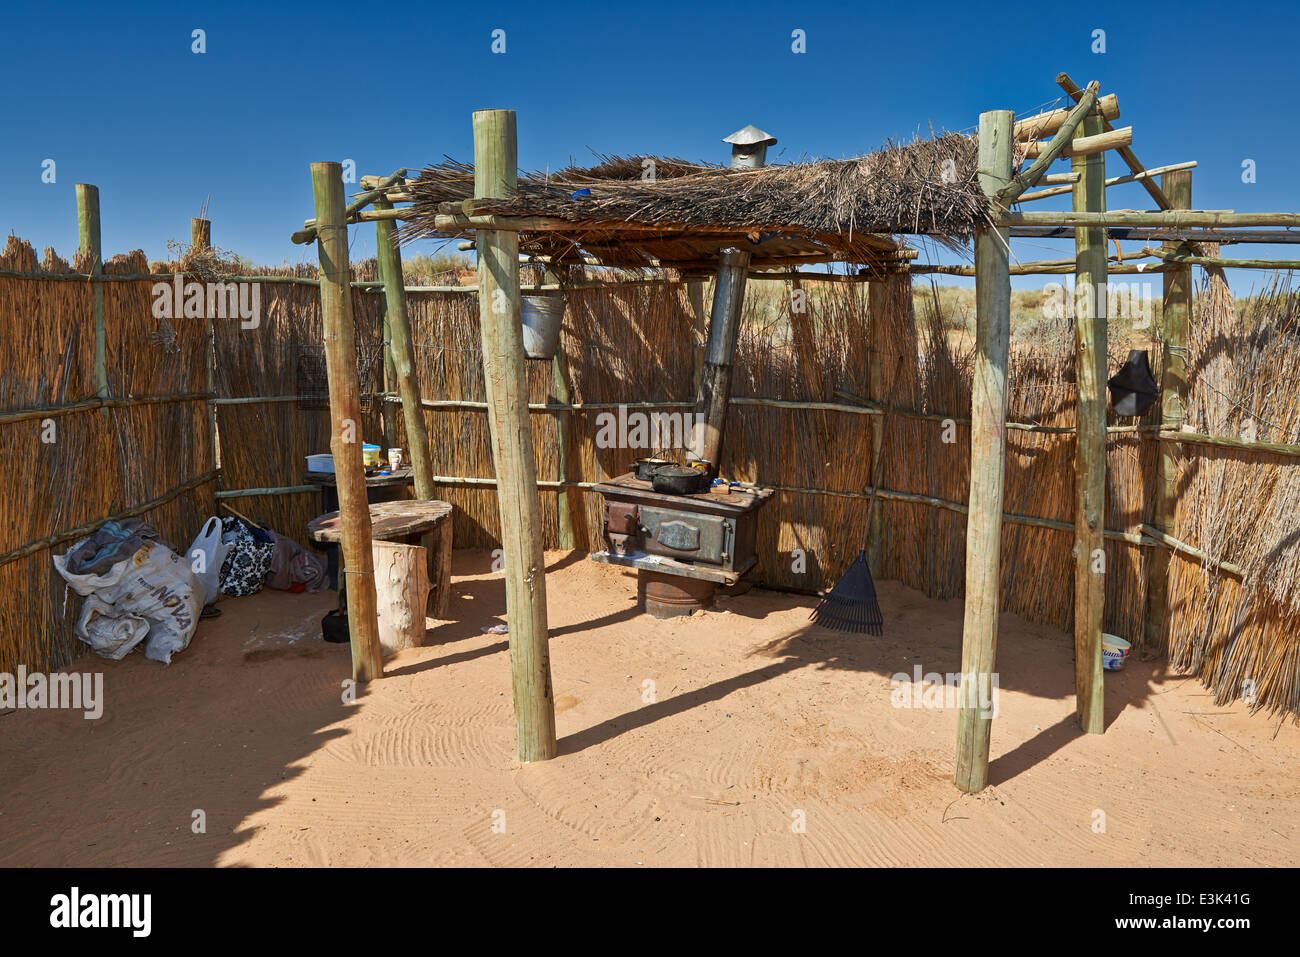 San or Bushmen village, Kgalagadi Transfrontier Park, Kalahari, South Africa, Botswana, Africa - Stock Image